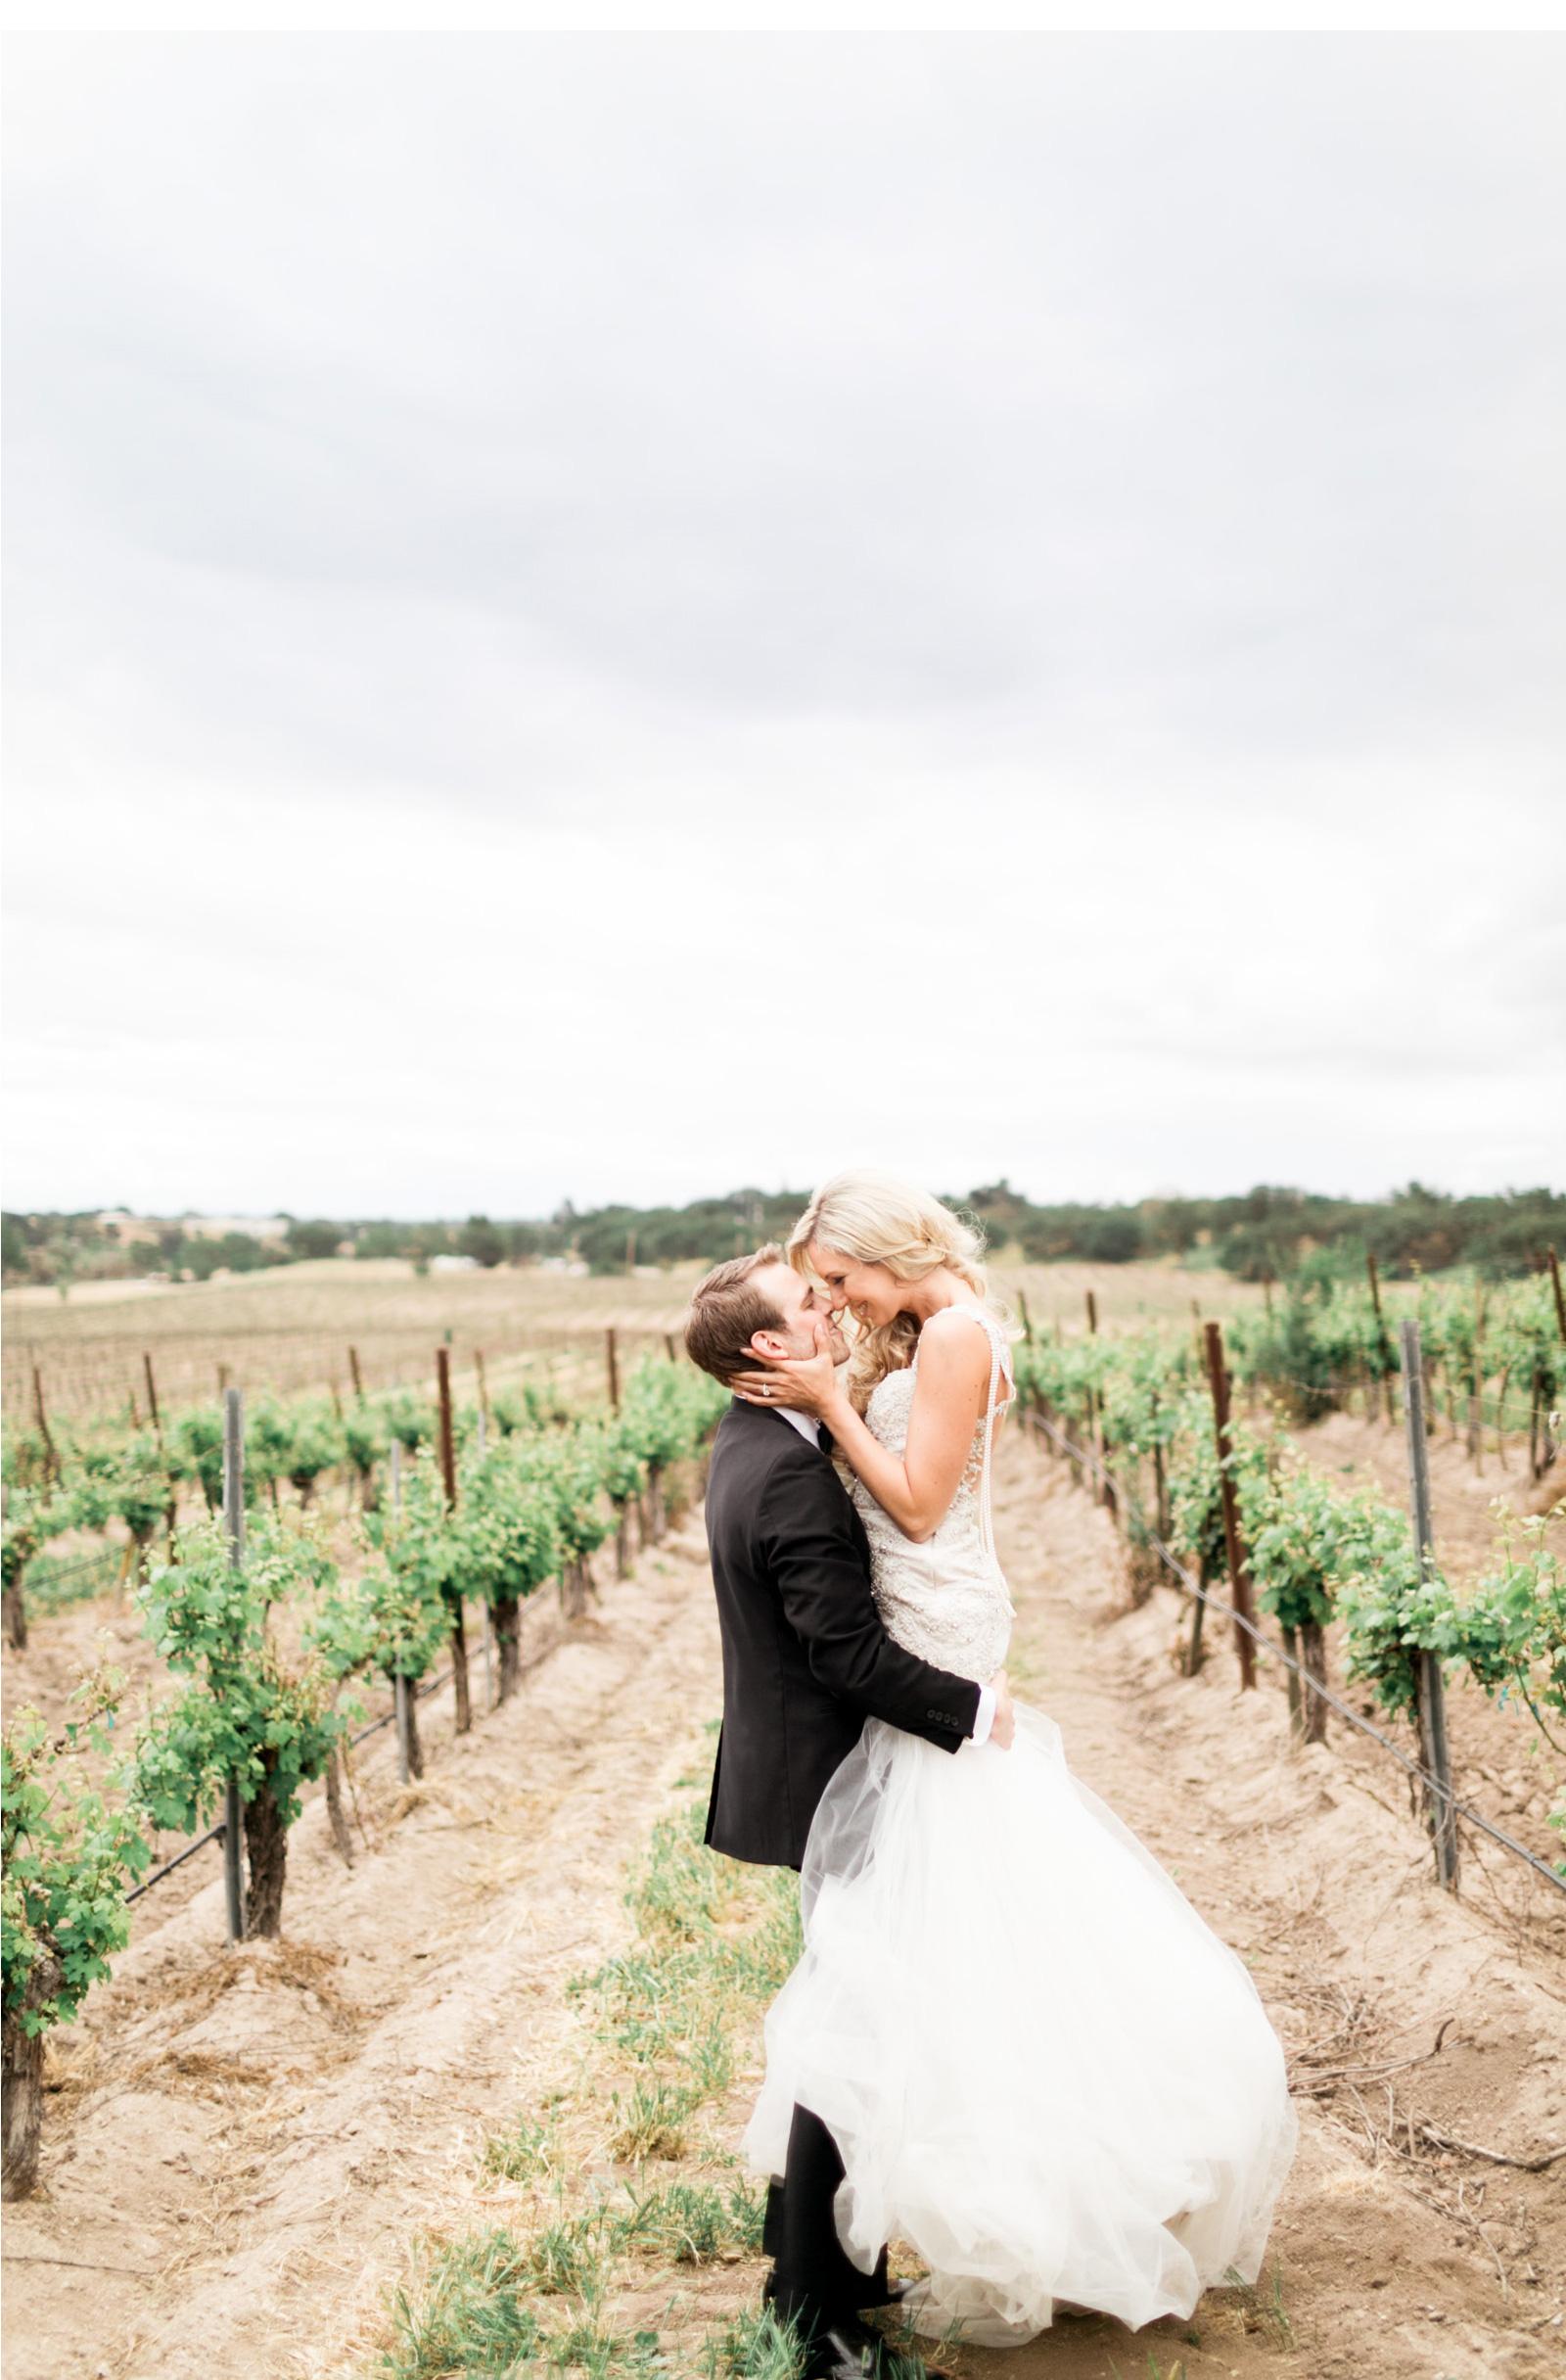 Style-Me-Pretty-Vineyard-Wedding-Natalie-Schutt-Photography_13.jpg